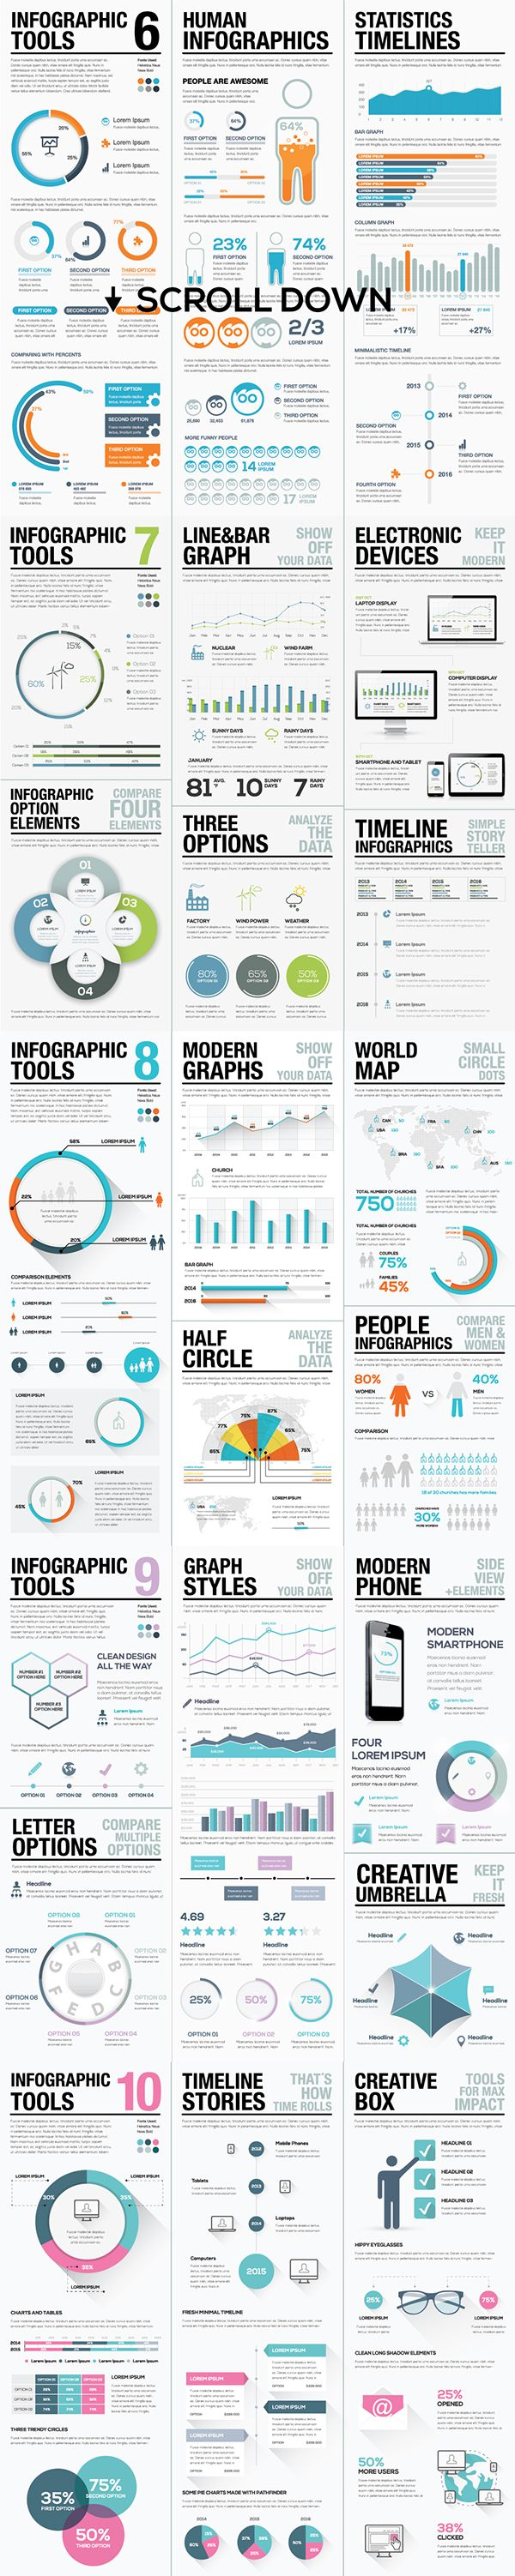 Infographic Elements Bundle on Behance